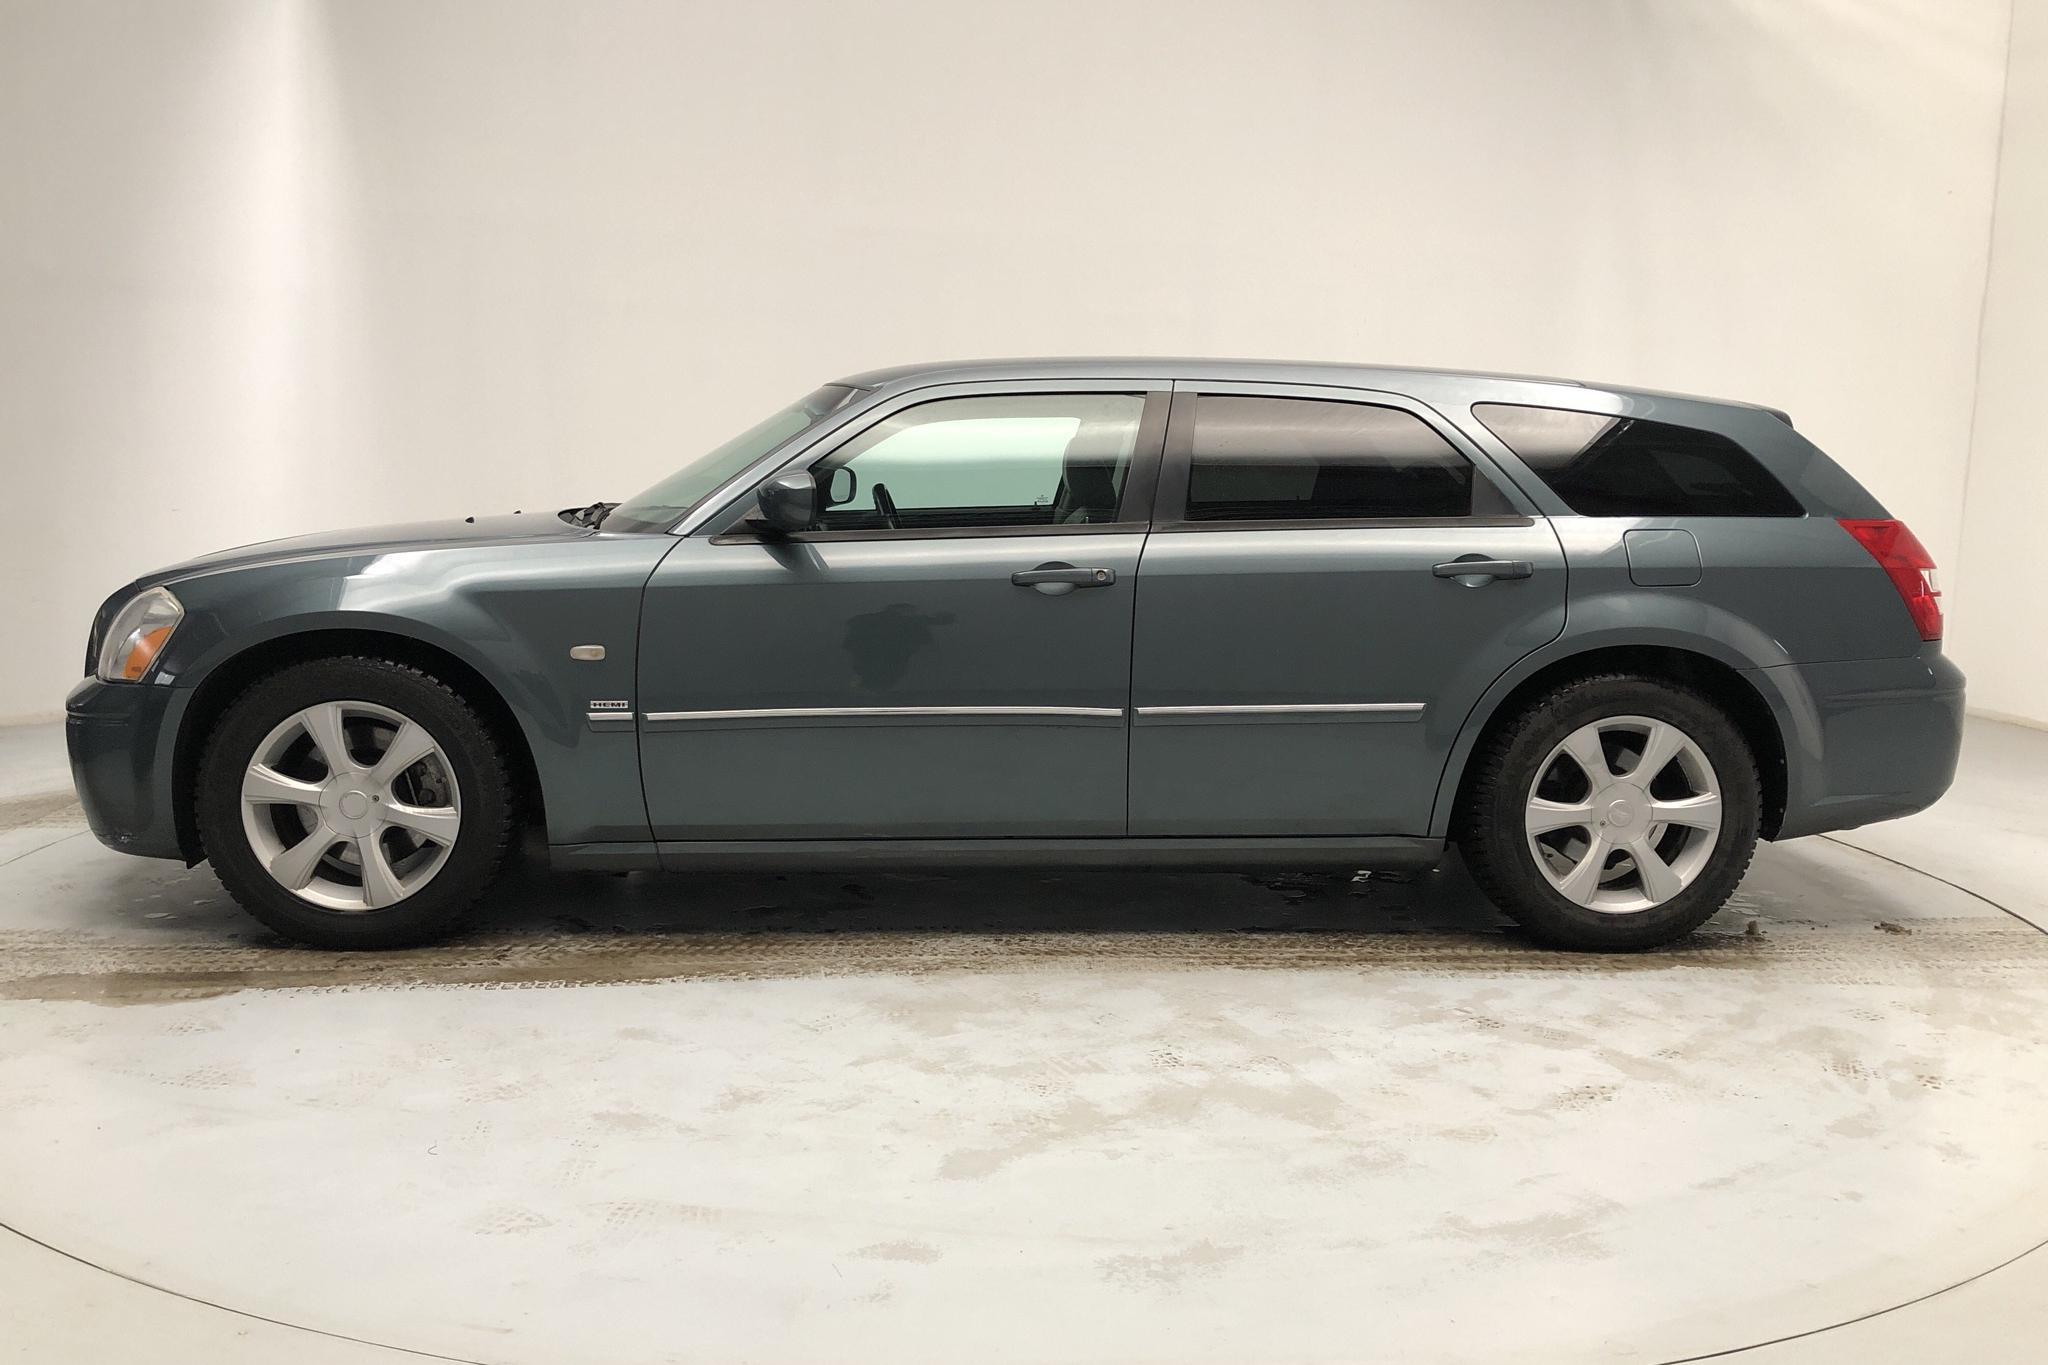 Dodge Magnum 5.7 Hemi V8 (345hk) - 19 185 mil - Automat - Dark Green - 2005